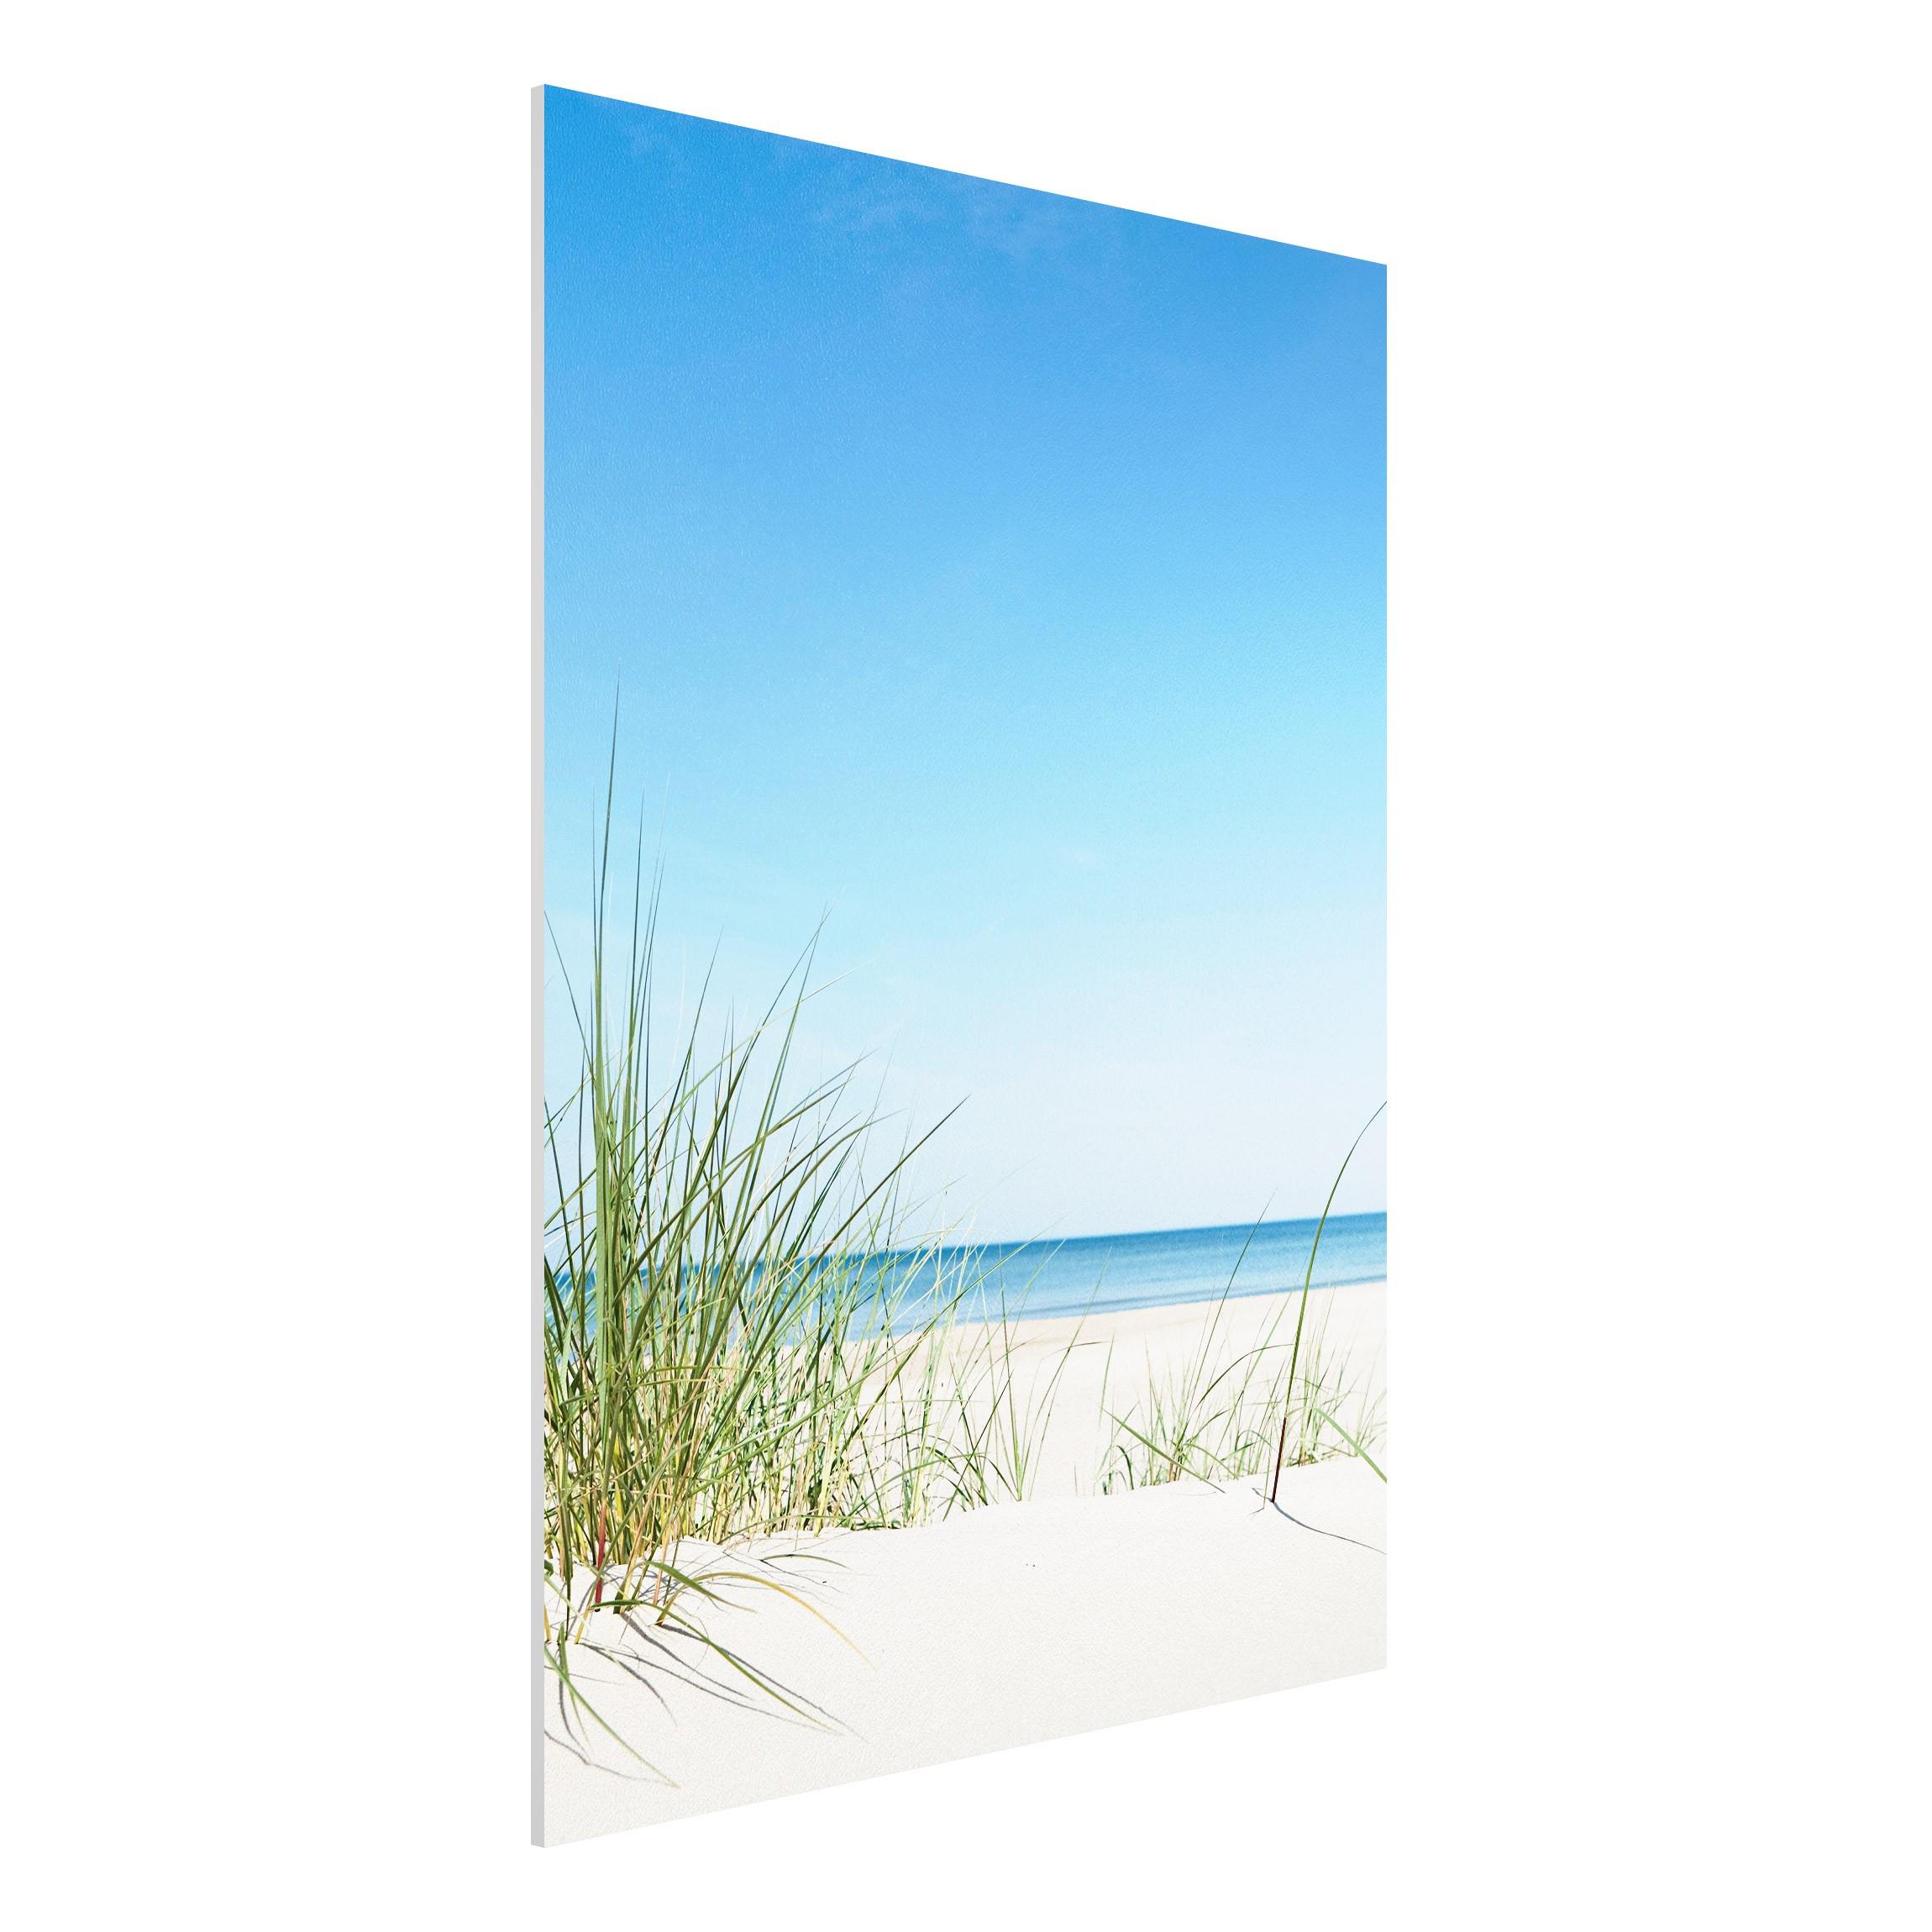 forex fine art print mural baltic coast high 4 3. Black Bedroom Furniture Sets. Home Design Ideas